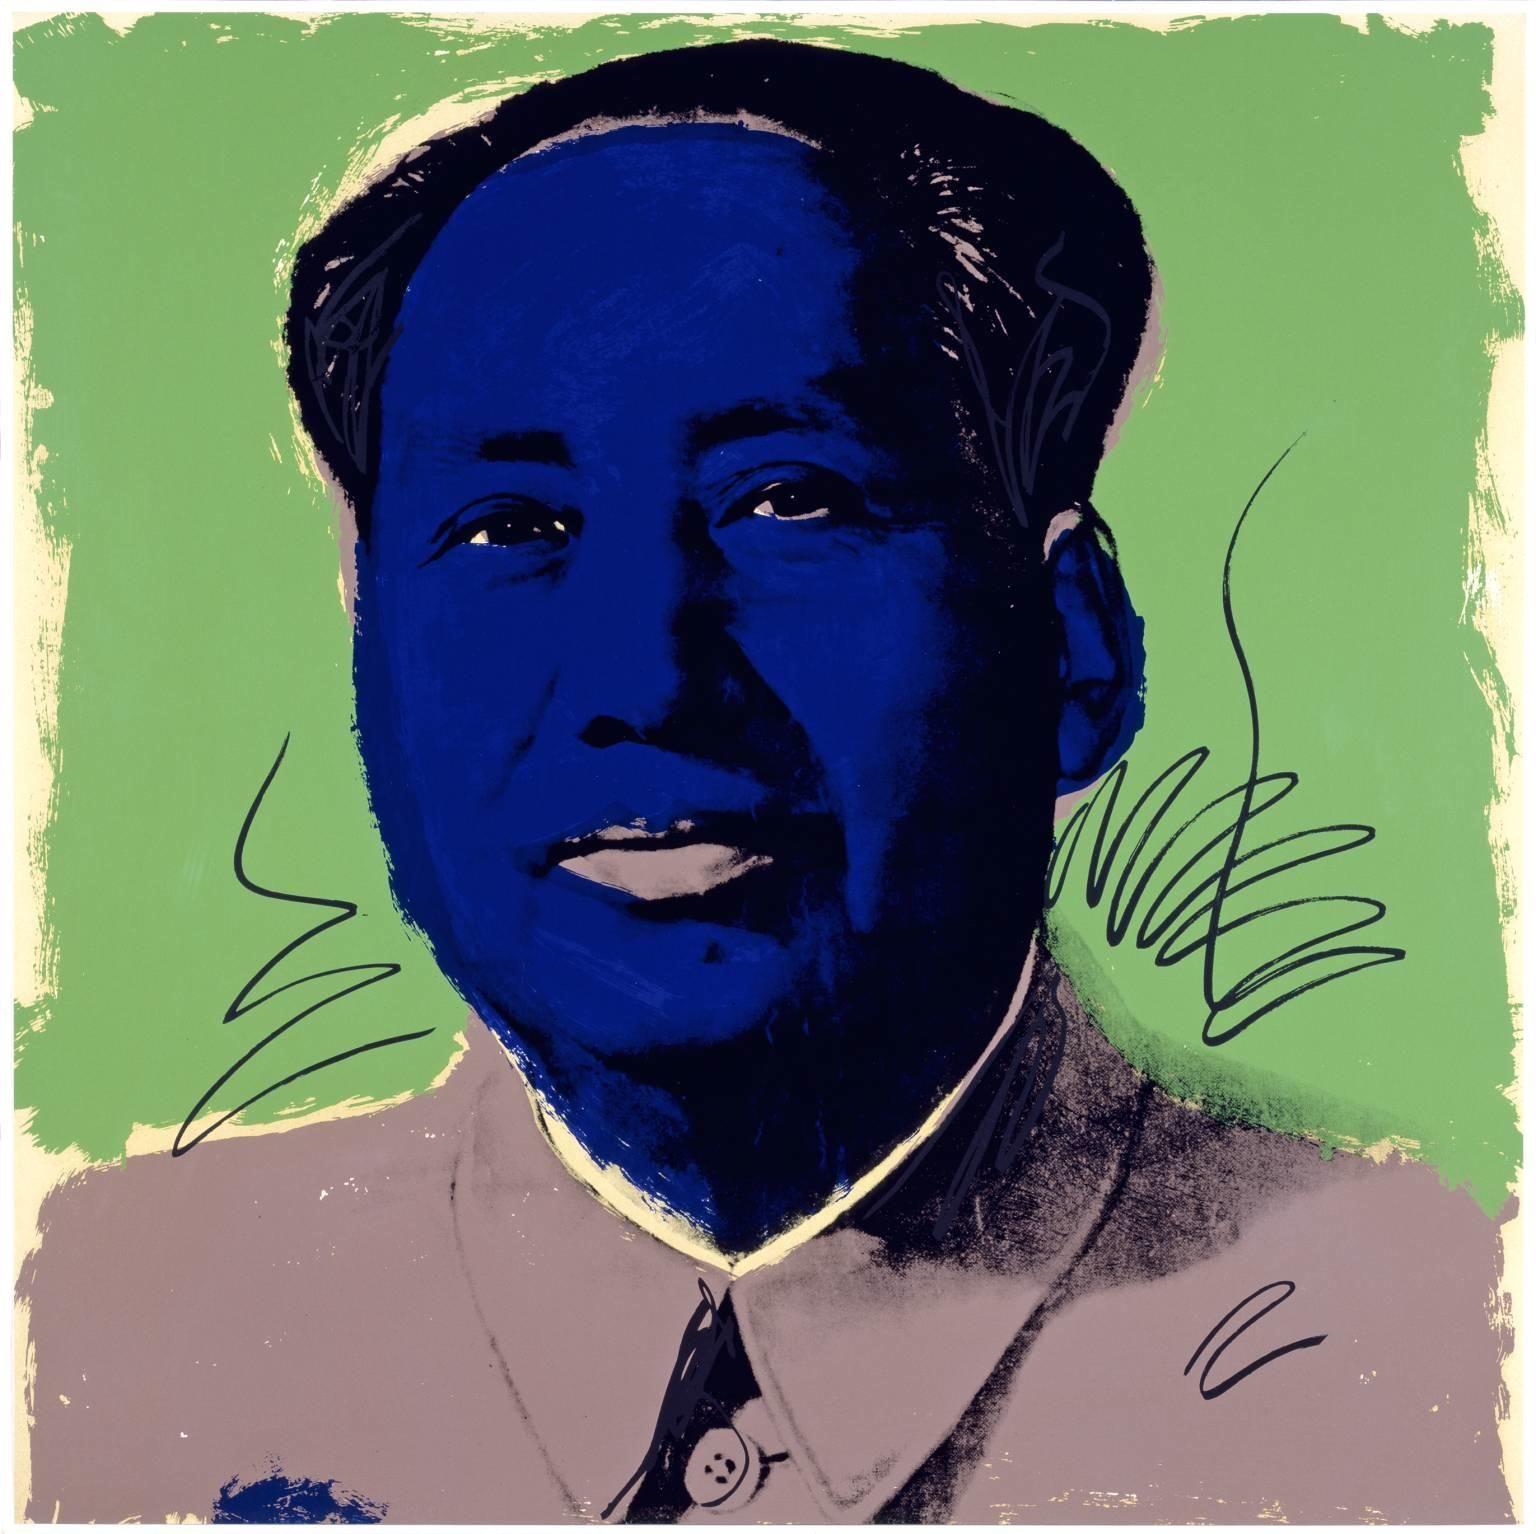 andy warhol - mao tse-tung (series) 2, 1972